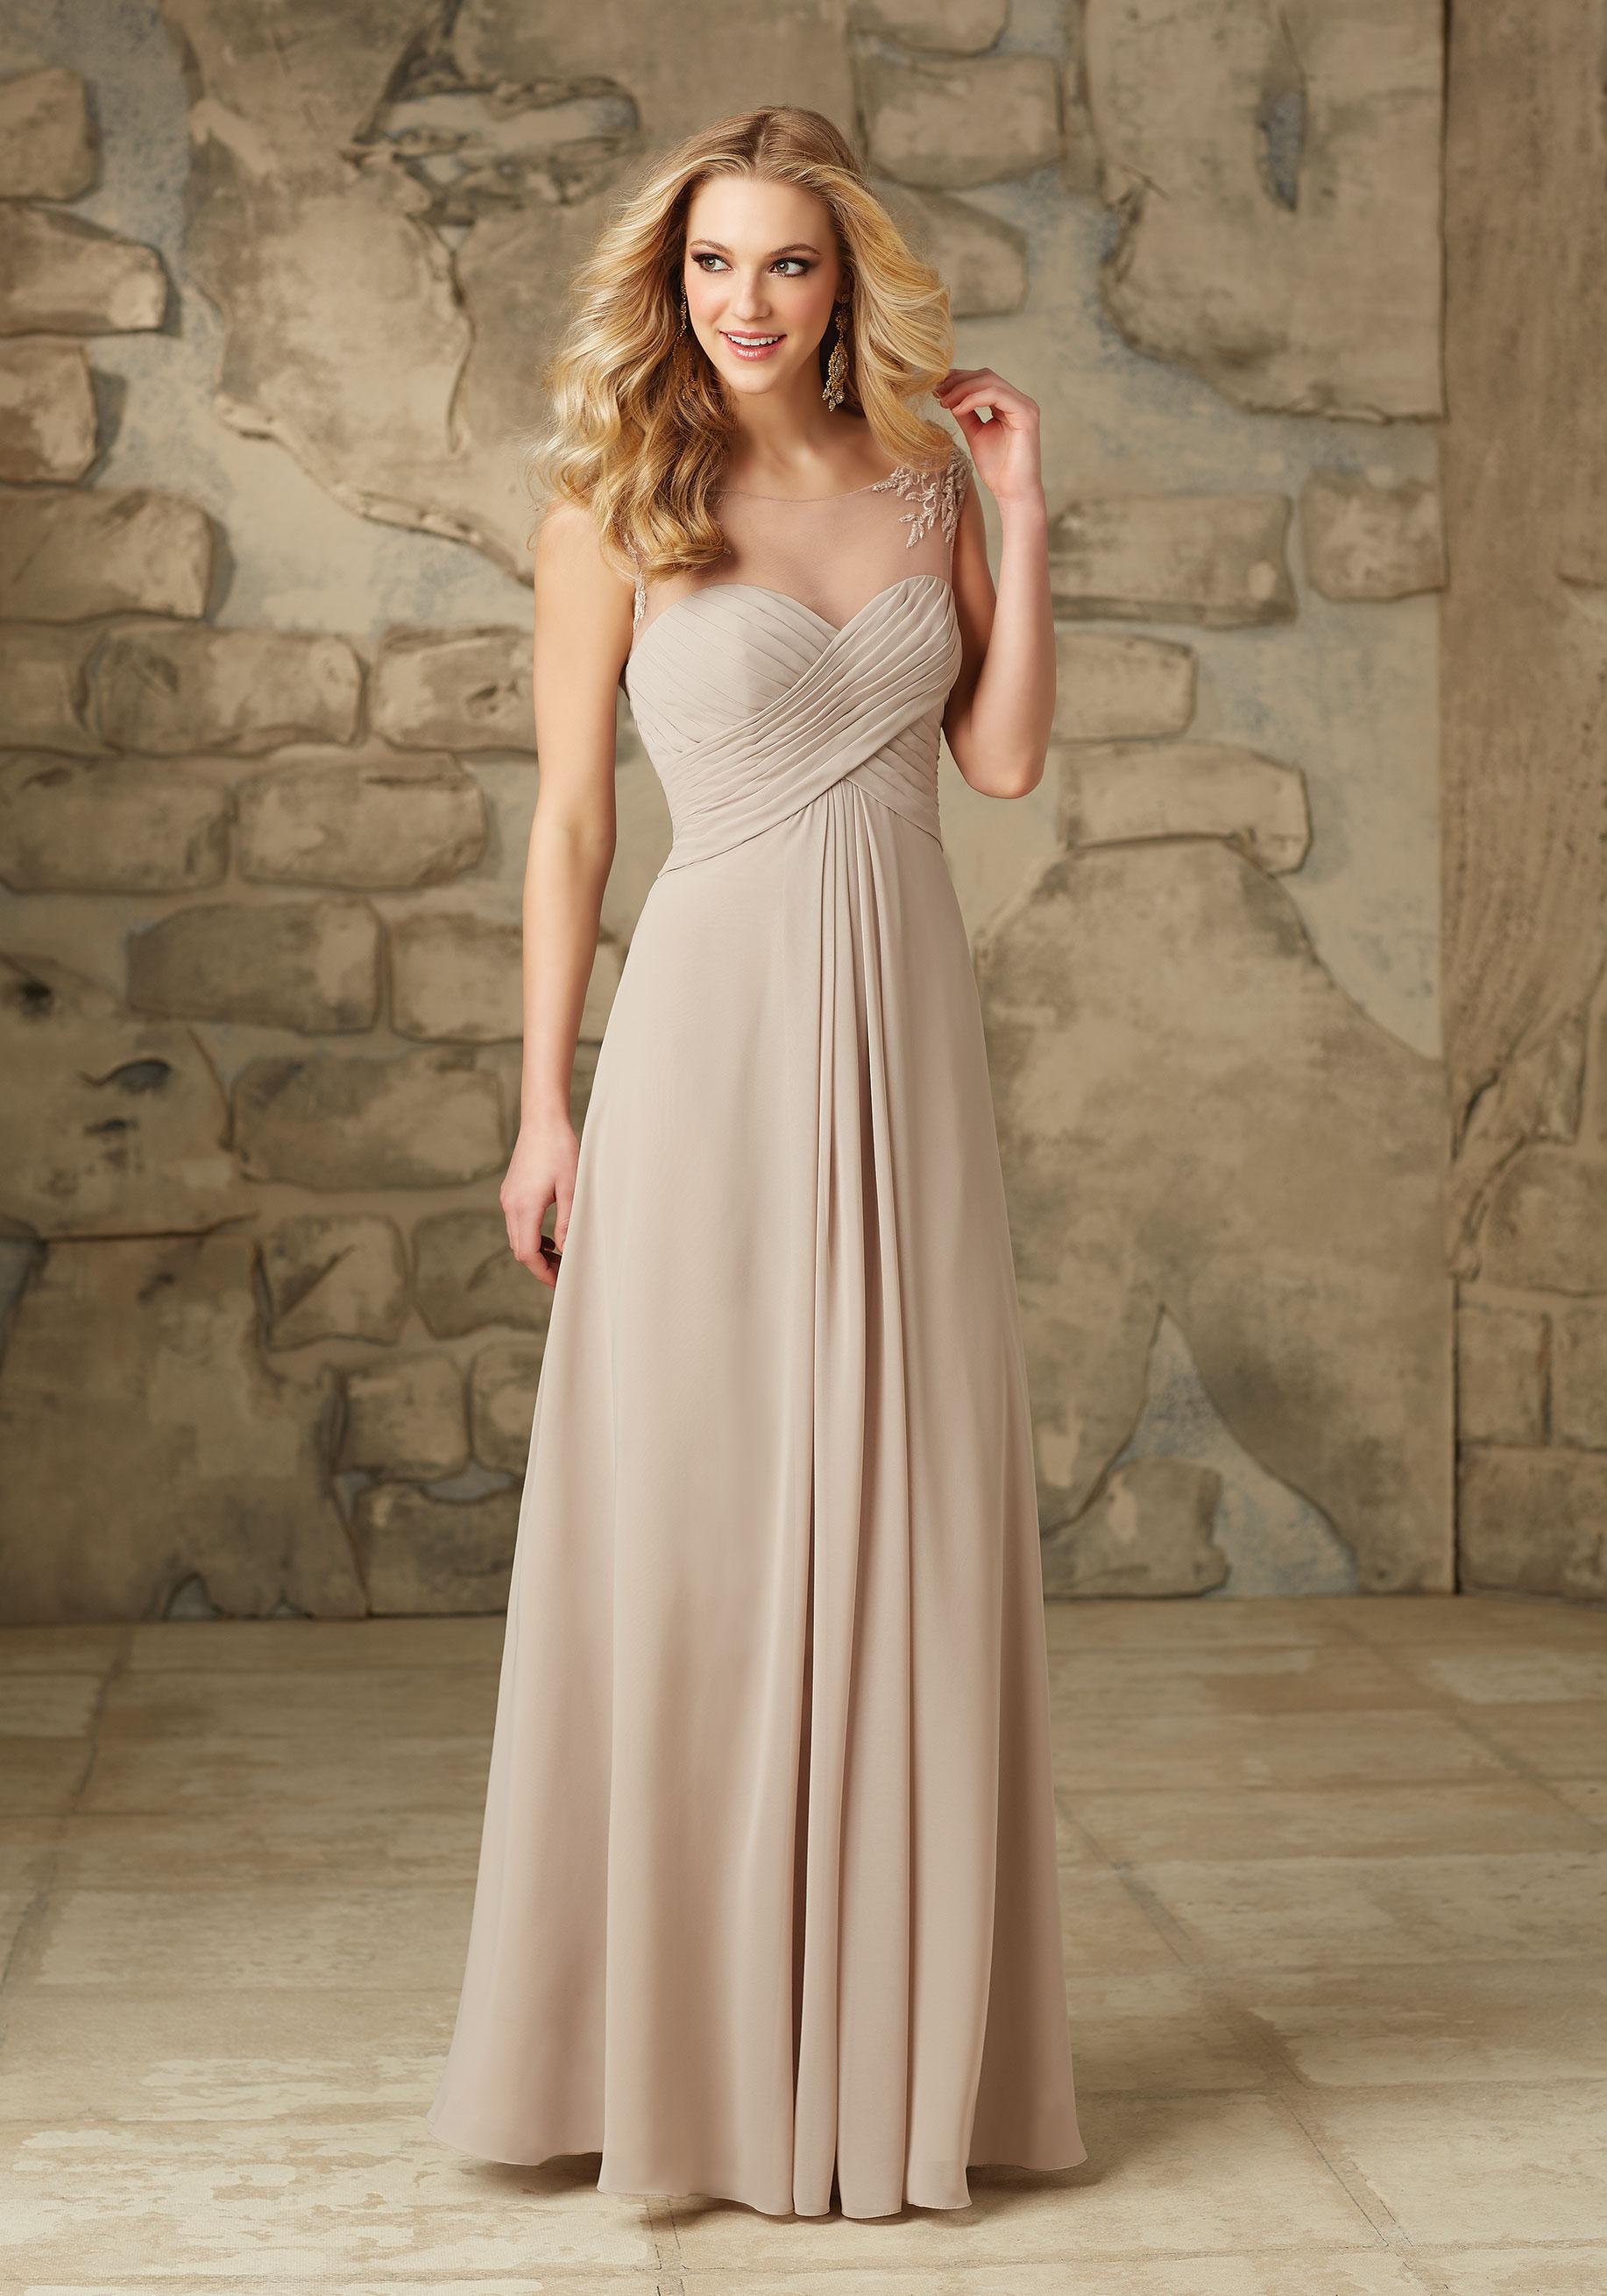 cb4b059c851 Mori lee 106 bridesmaid dress - Catrinas Bridal